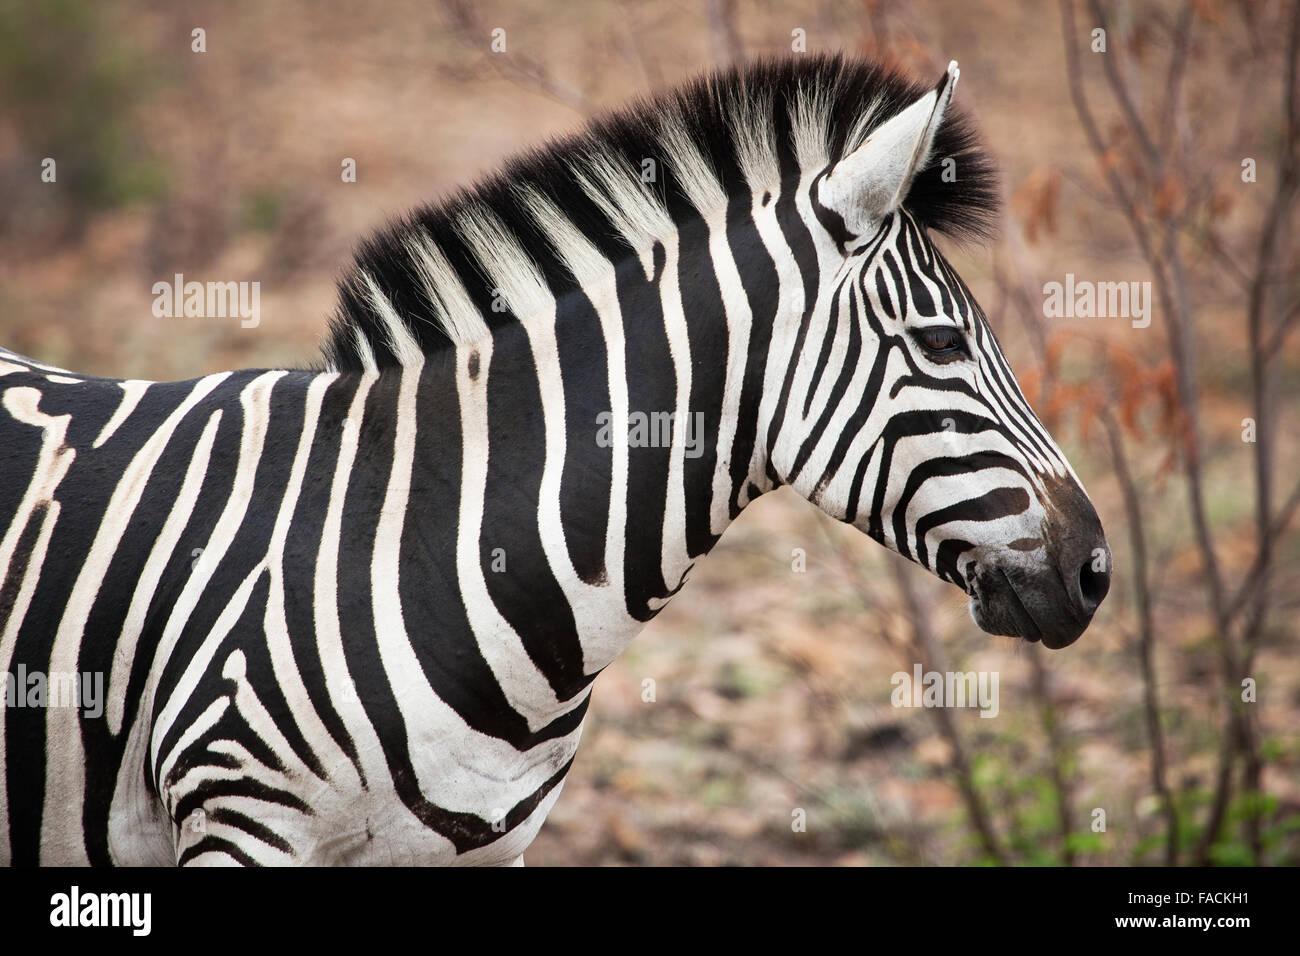 African Zebra closeup Immagini Stock